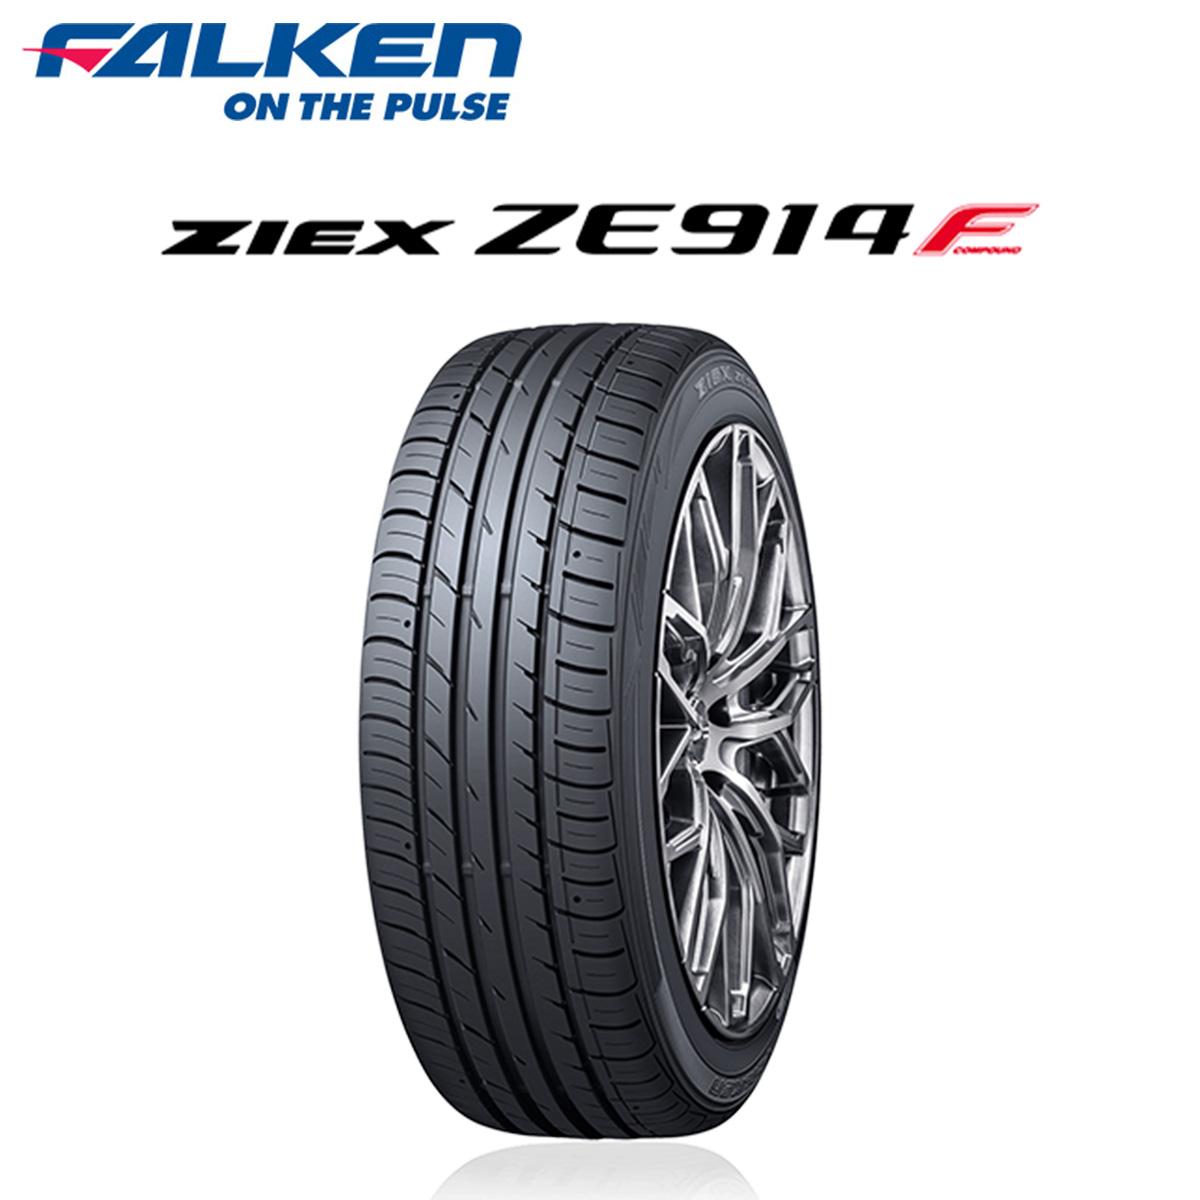 FALKEN ファルケン 低燃費 サマータイヤ 4本 セット 18インチ 245/45R18 ZIEX ZE914F ジークス